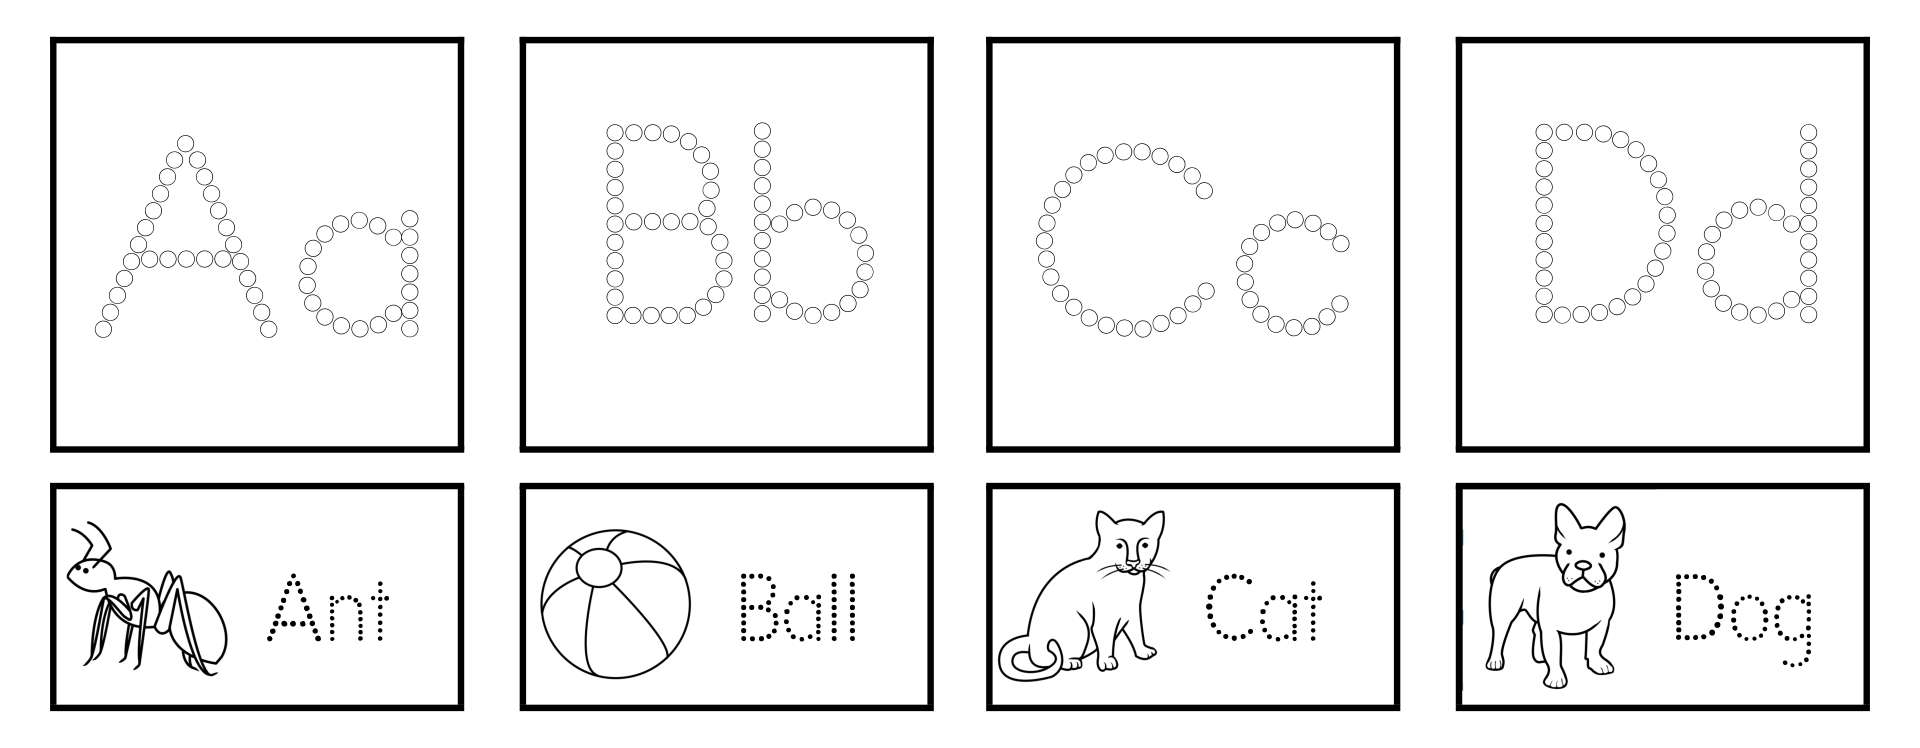 ABC Q-Tip Painting Printables